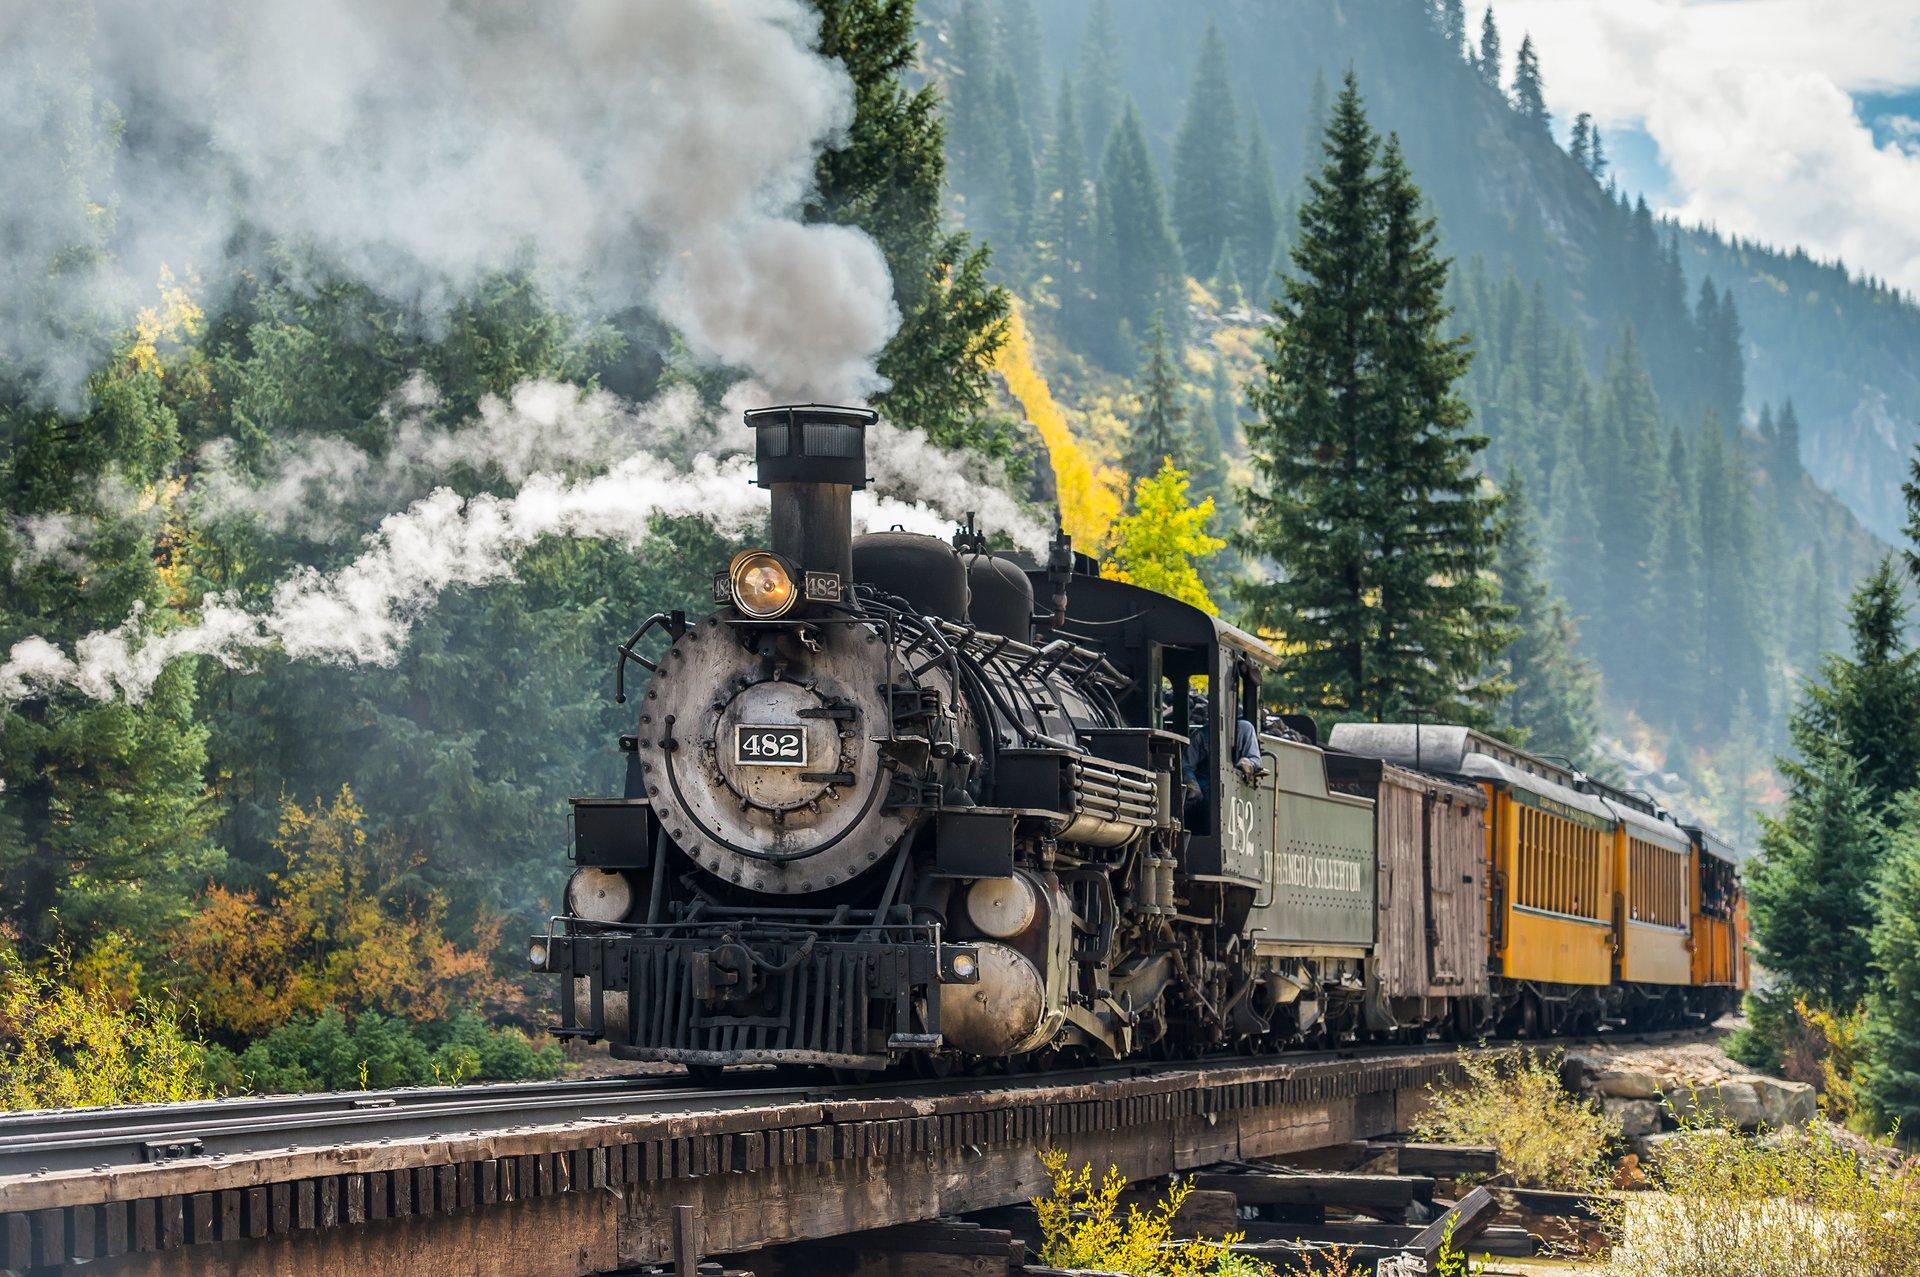 A train on the Durango & Silverton Narrow Gauge Railroad